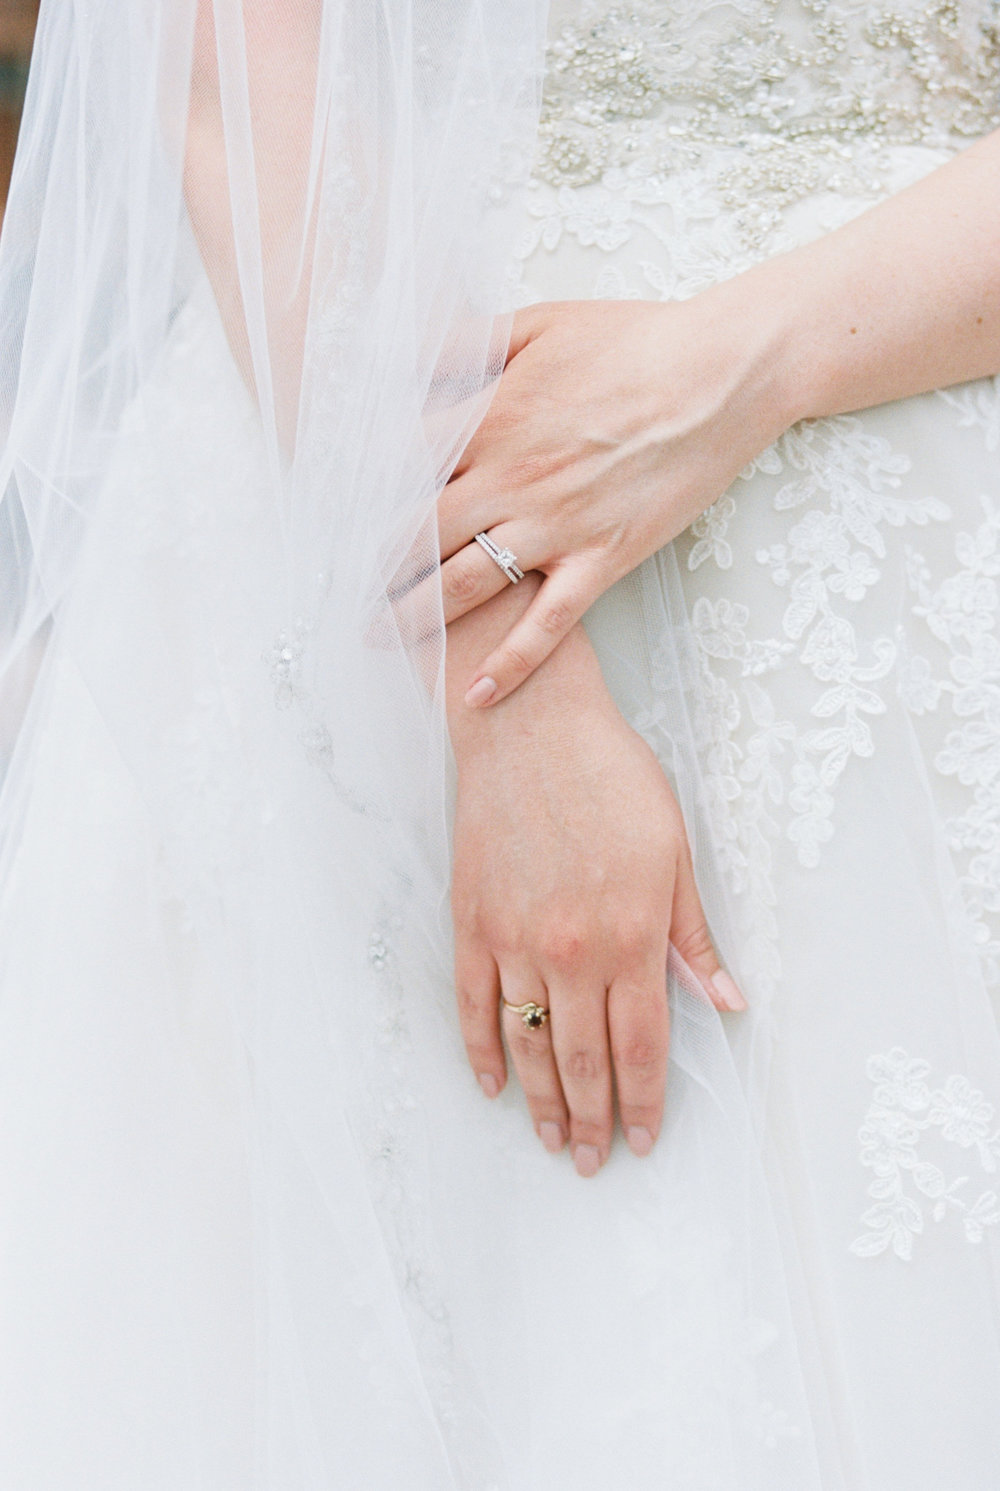 Lydia_johnathan_Wedding_Abigail_Malone_Photography-568.jpg